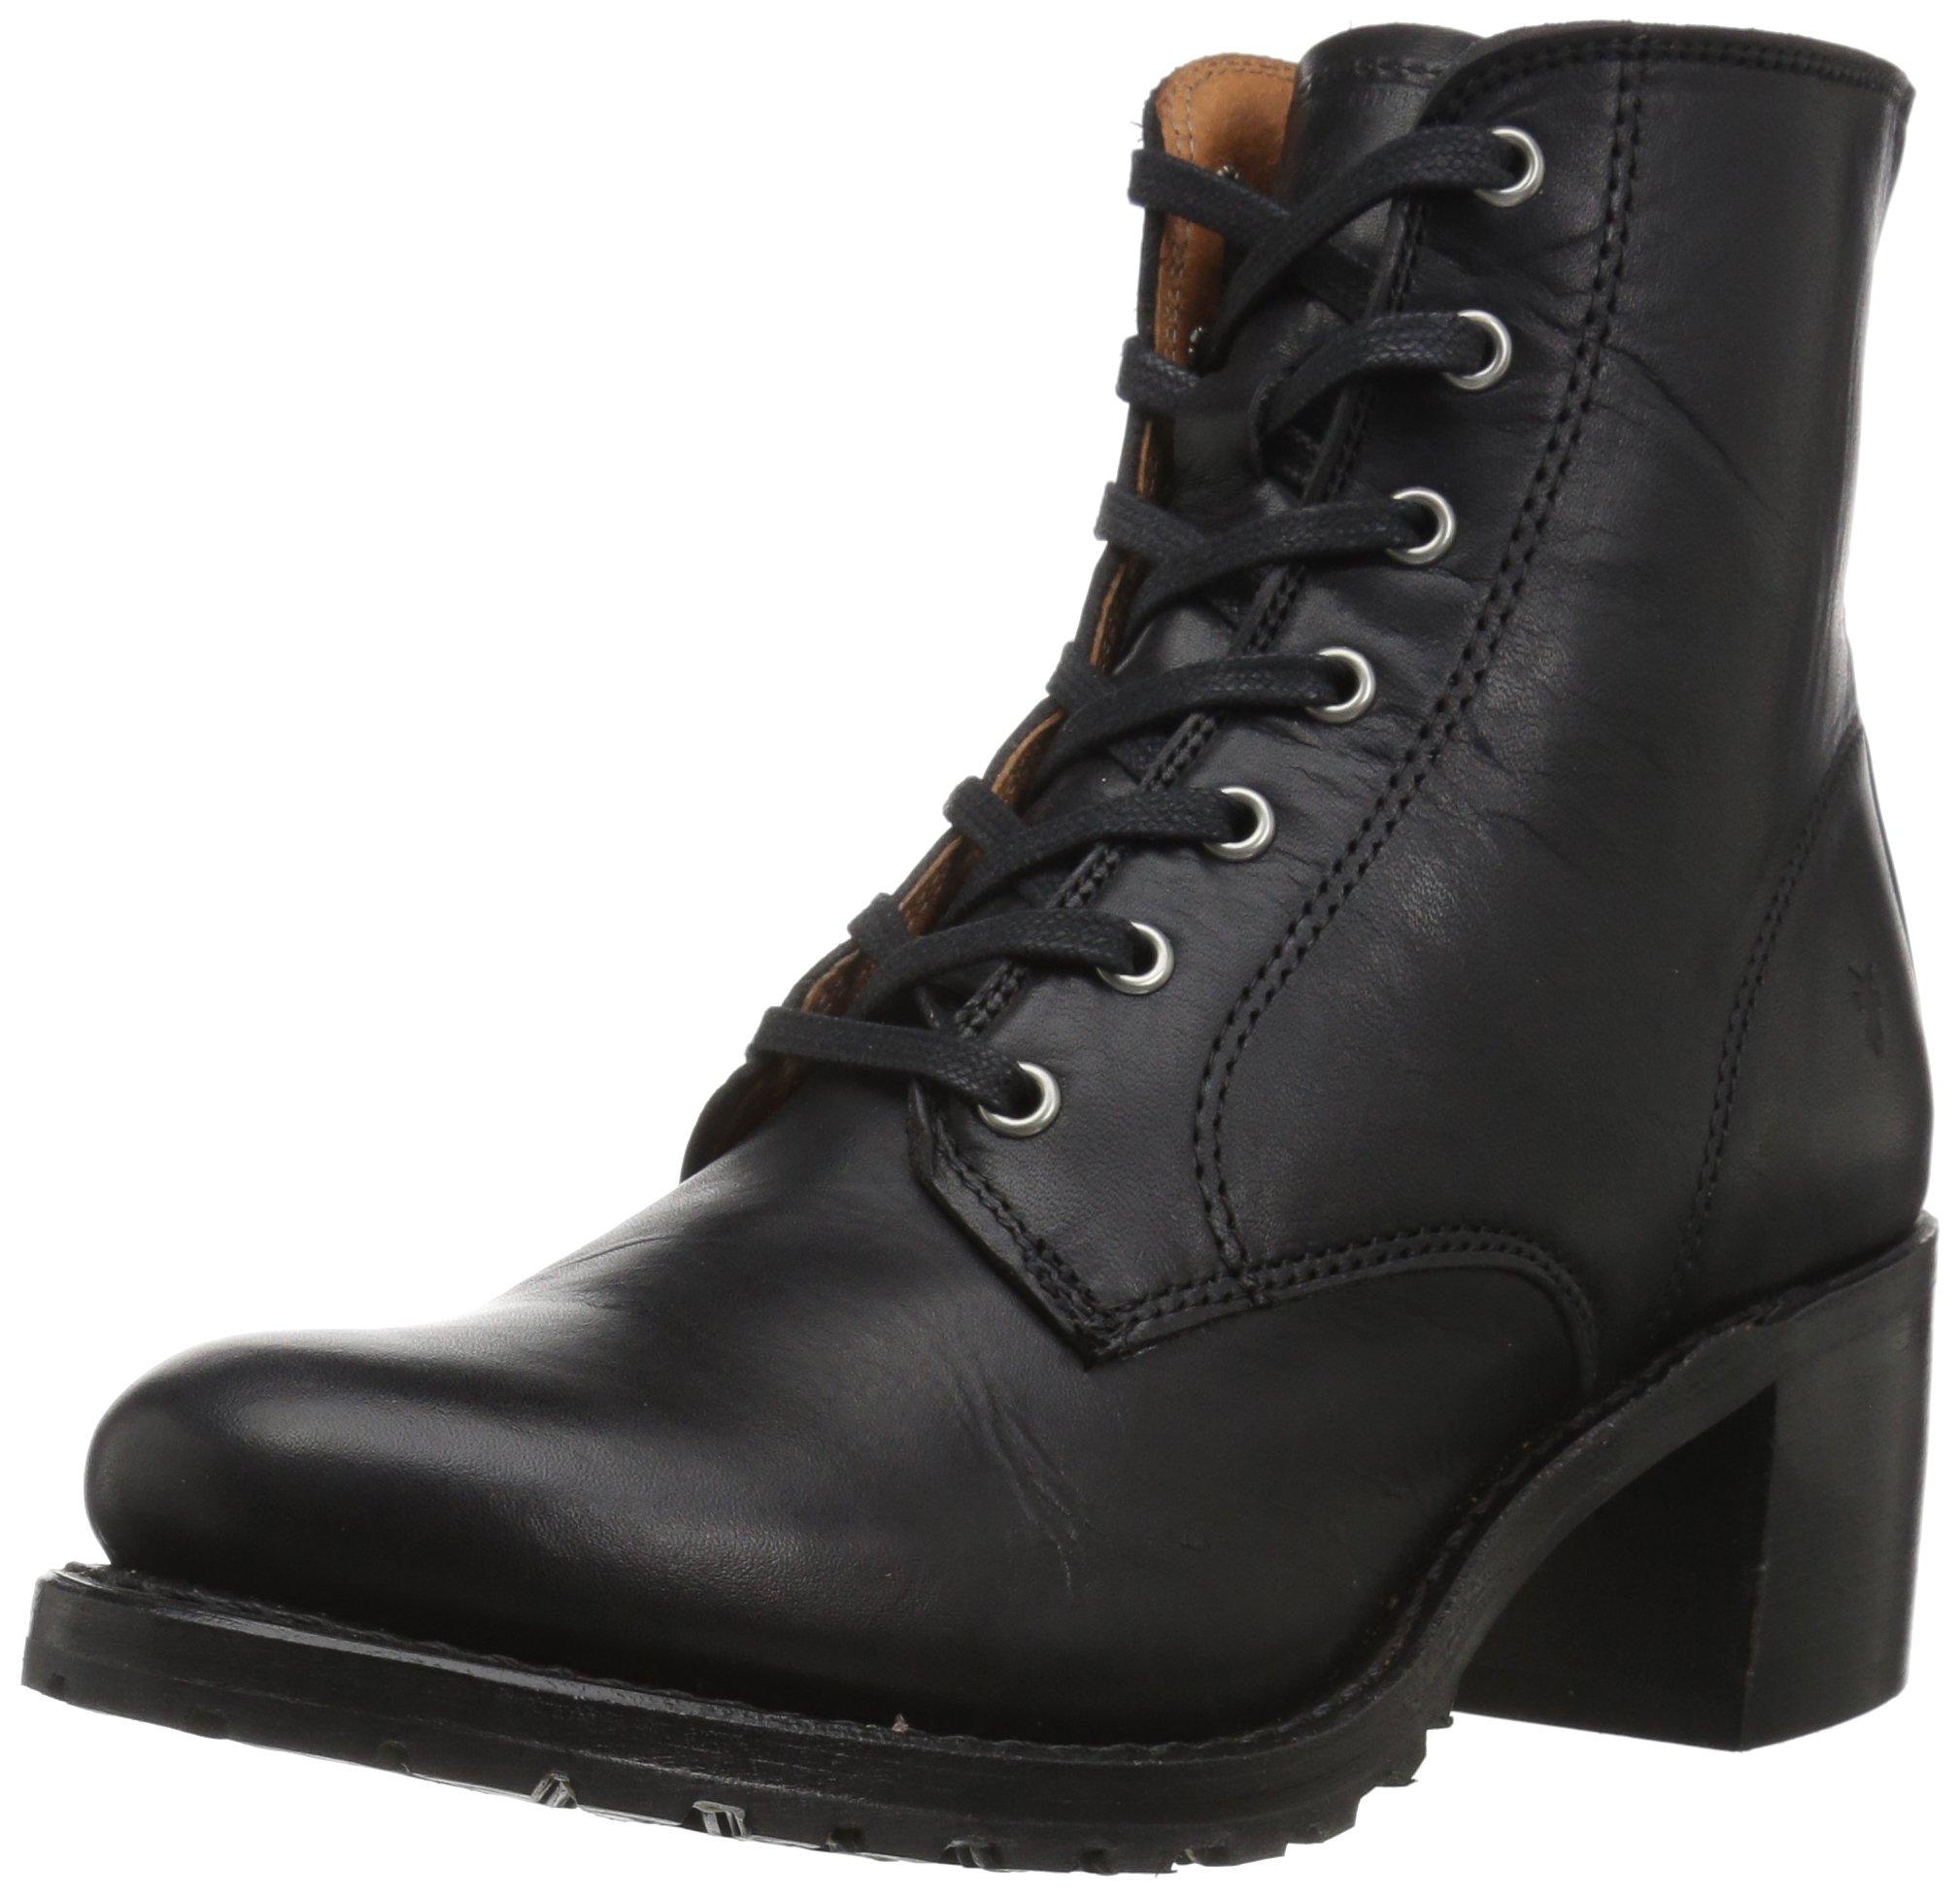 FRYE Women's Sabrina 6G Lace-Up Boot